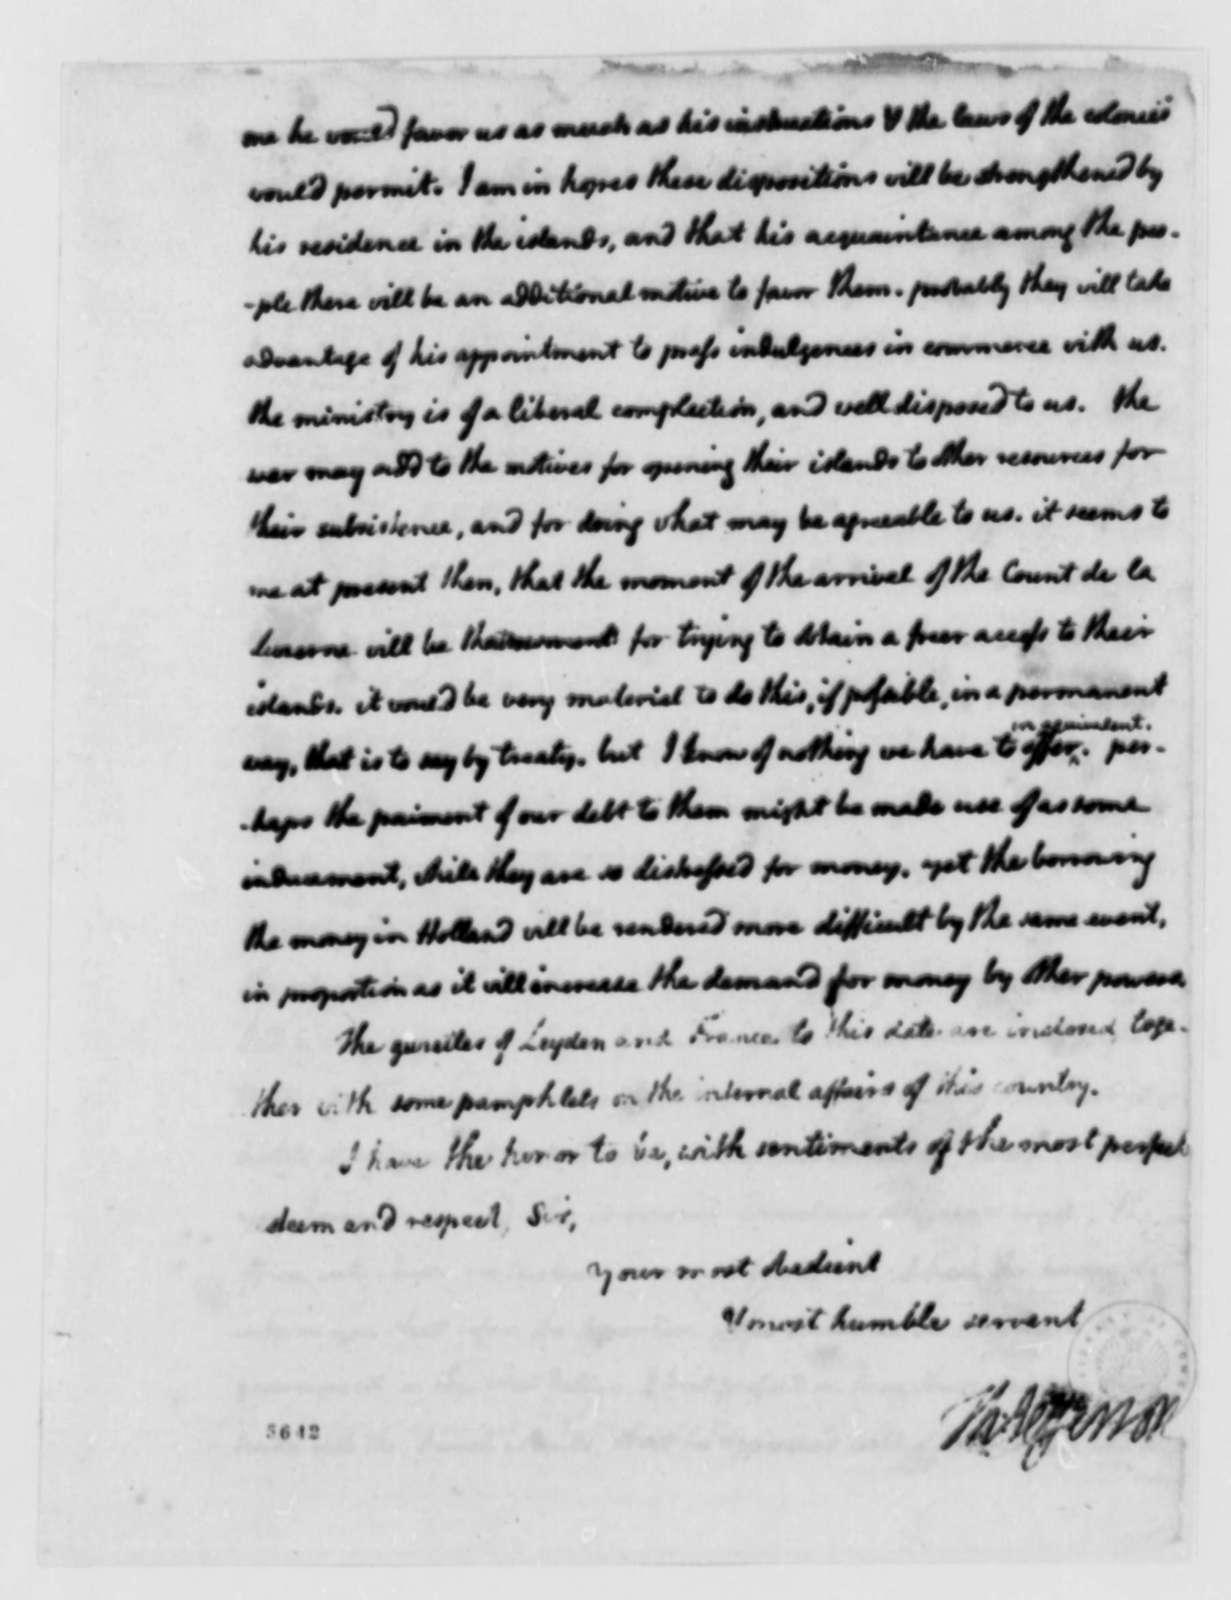 Thomas Jefferson to John Jay, September 19, 1787